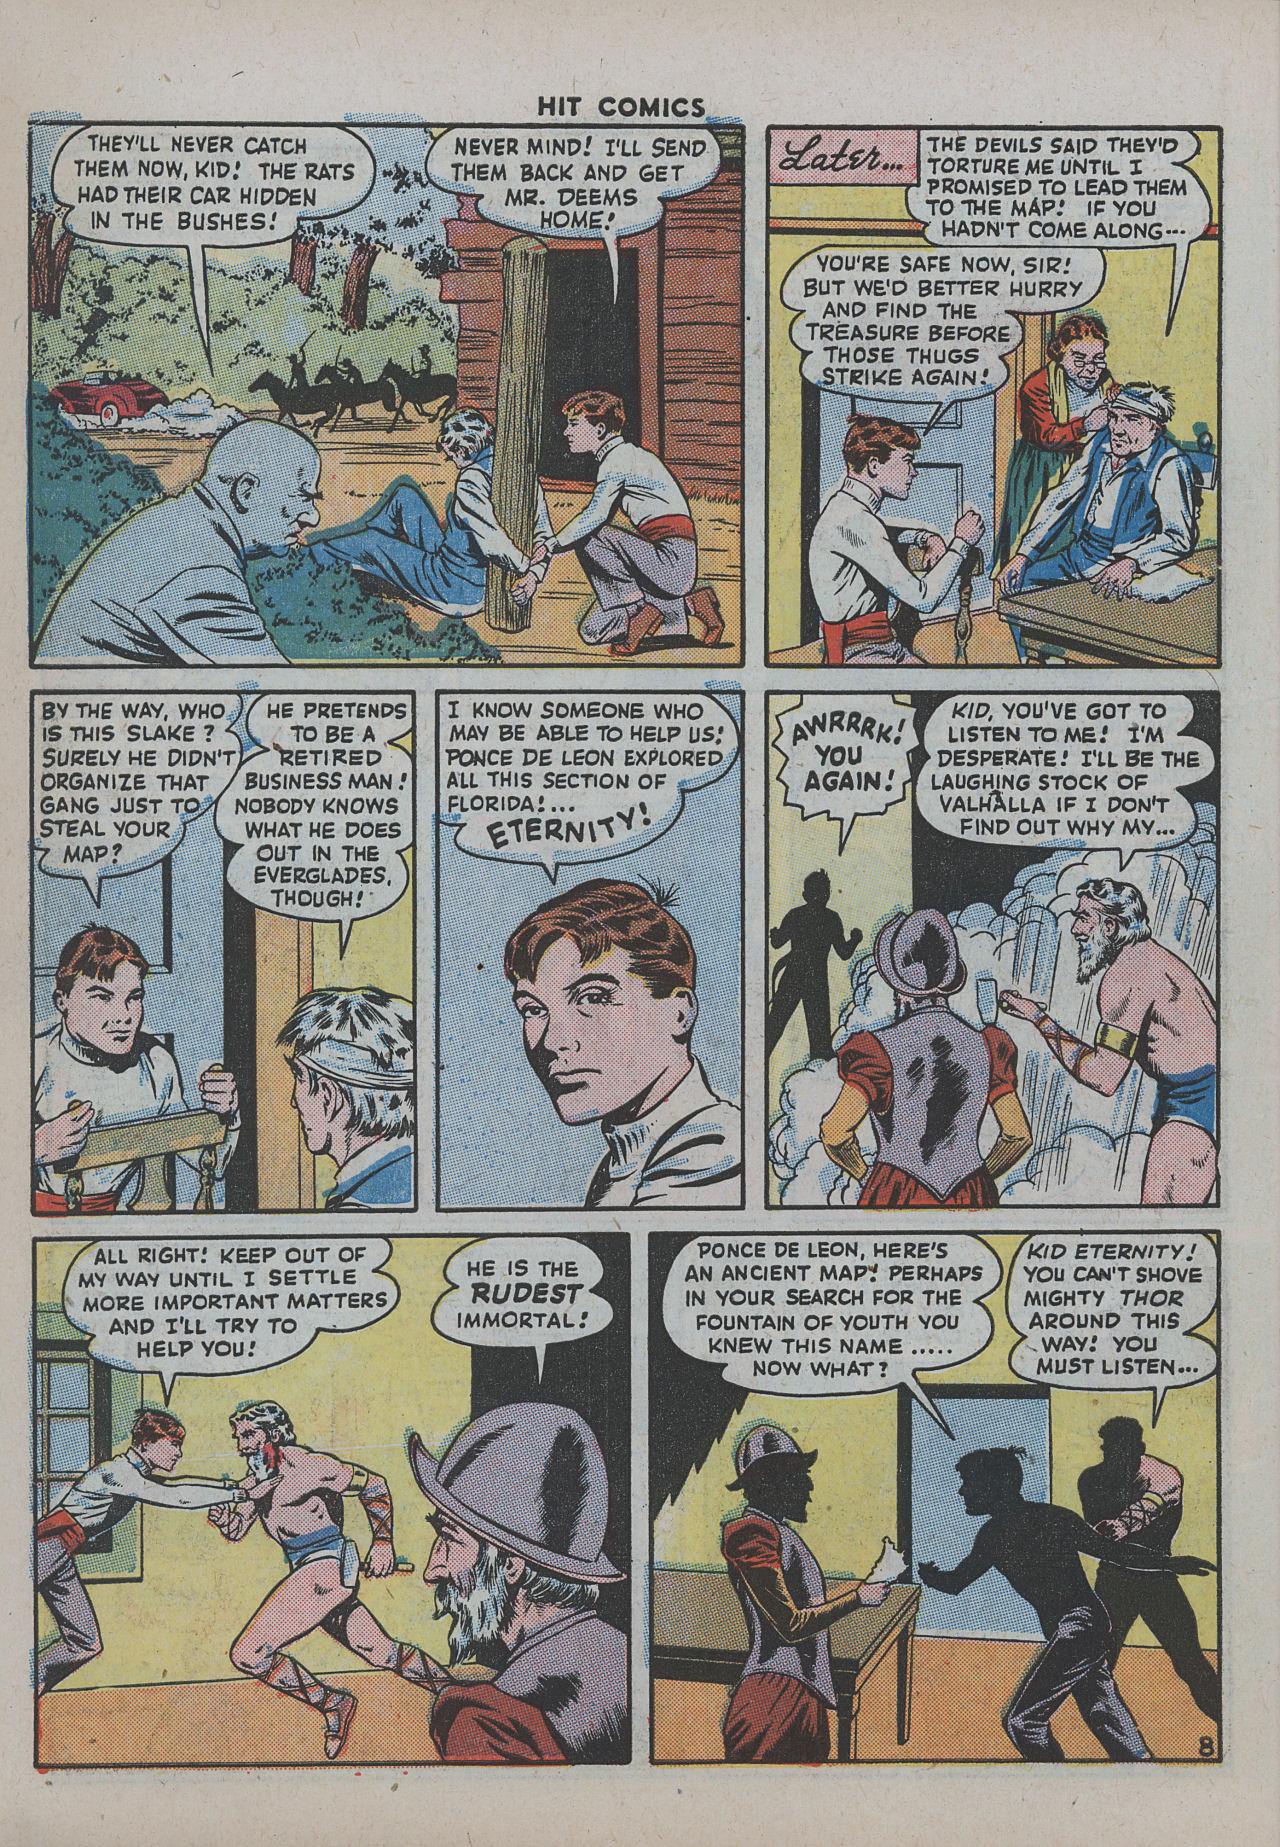 Read online Hit Comics comic -  Issue #38 - 13